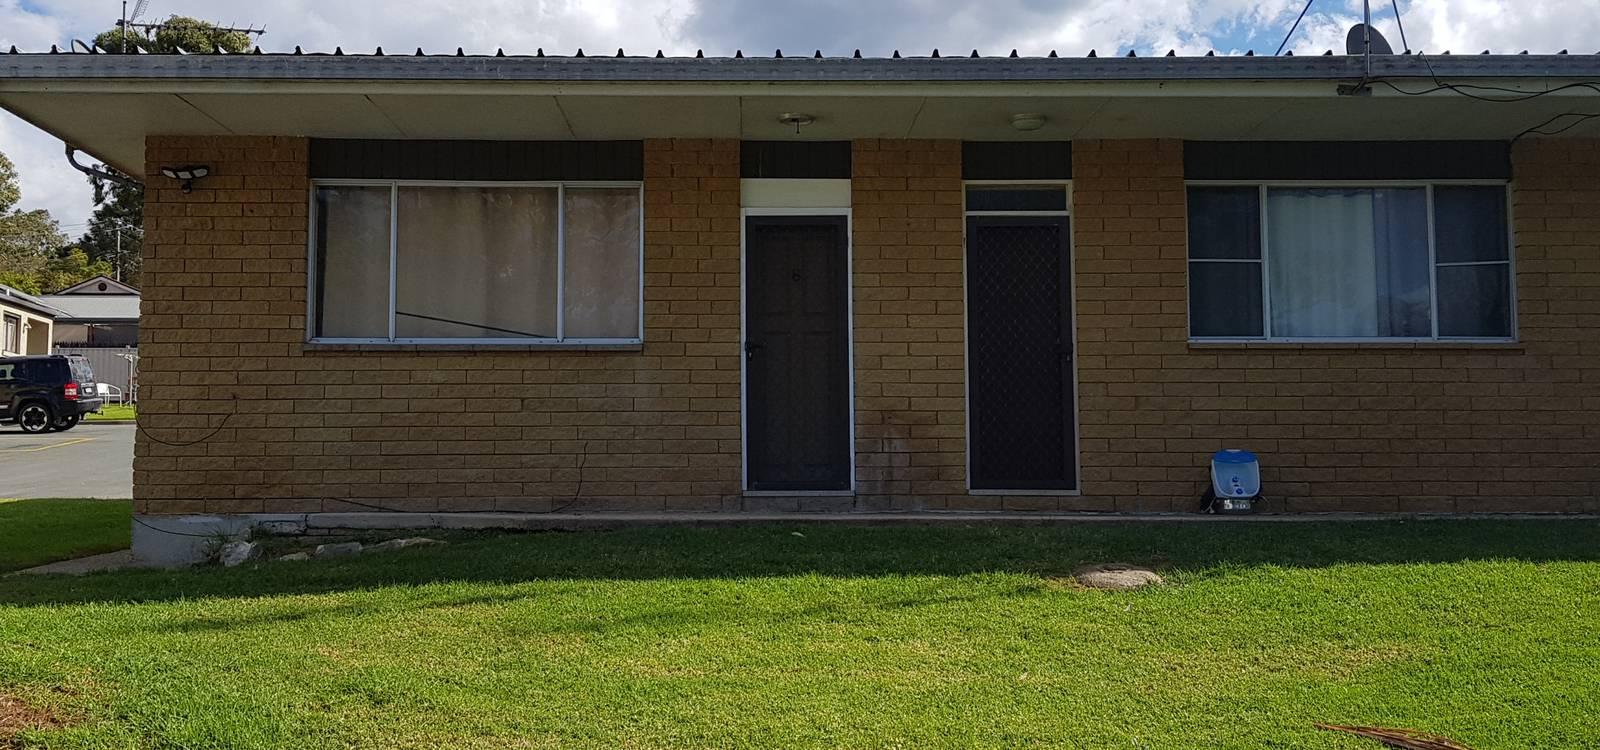 9/67 Evans Street MORUYA, NSW 2537 - photo 1